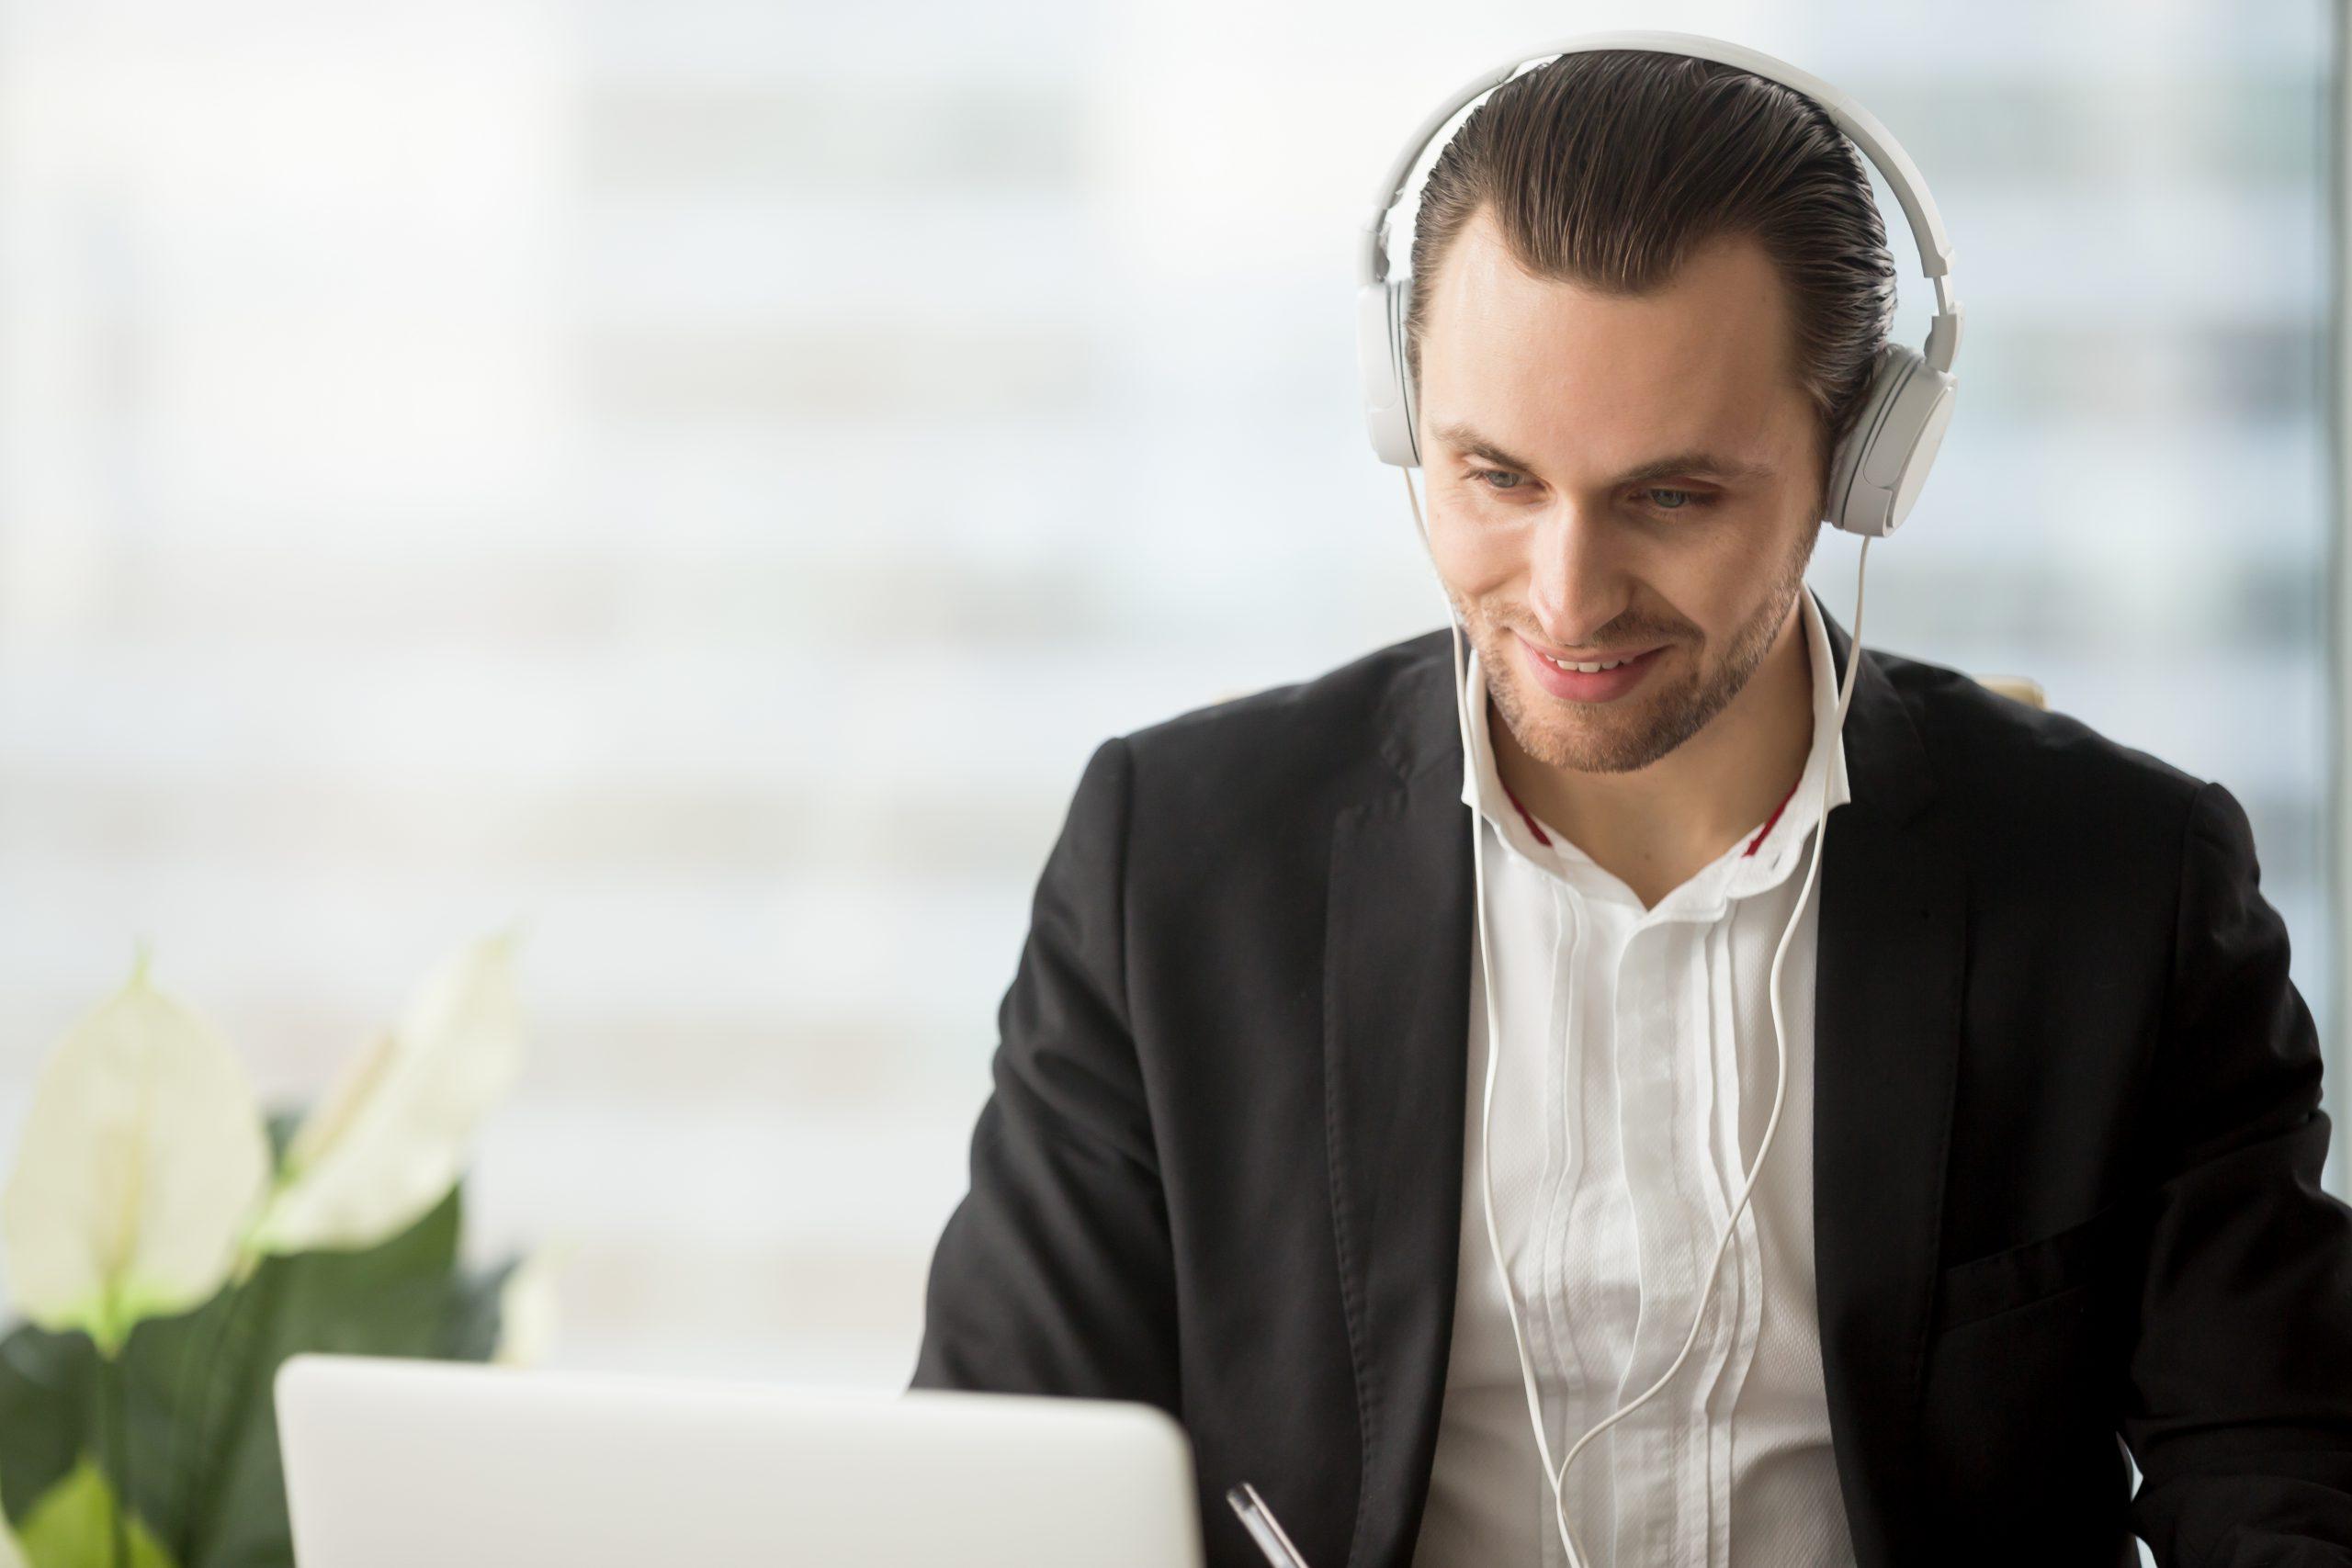 talk to team members regularly